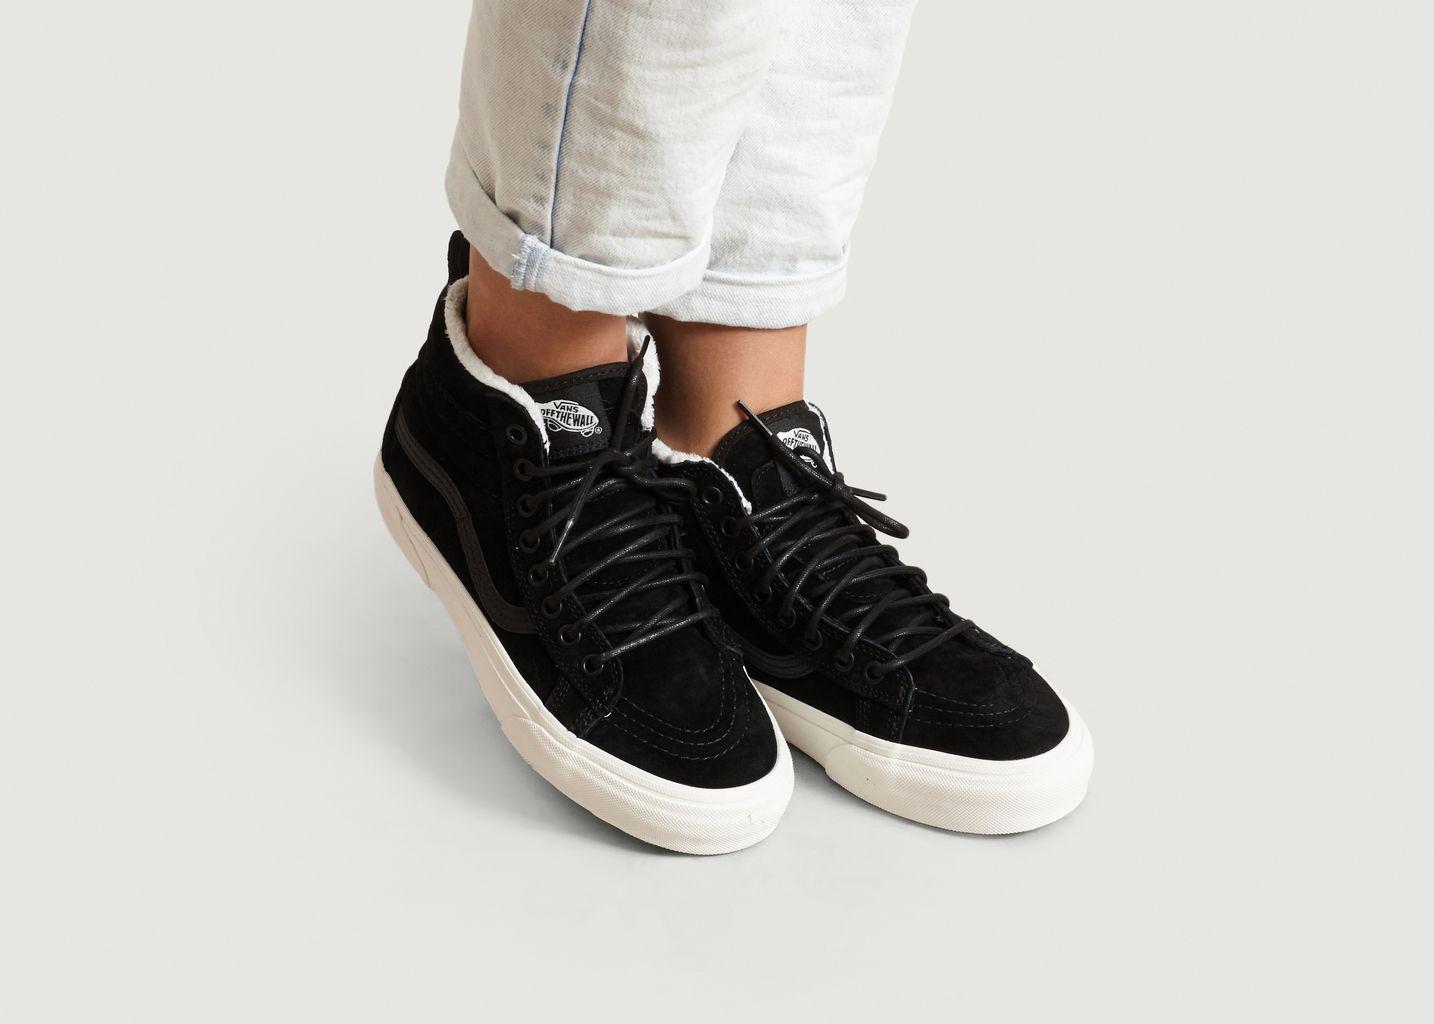 Sneakers SK8-HI Mountain Edition - Vans